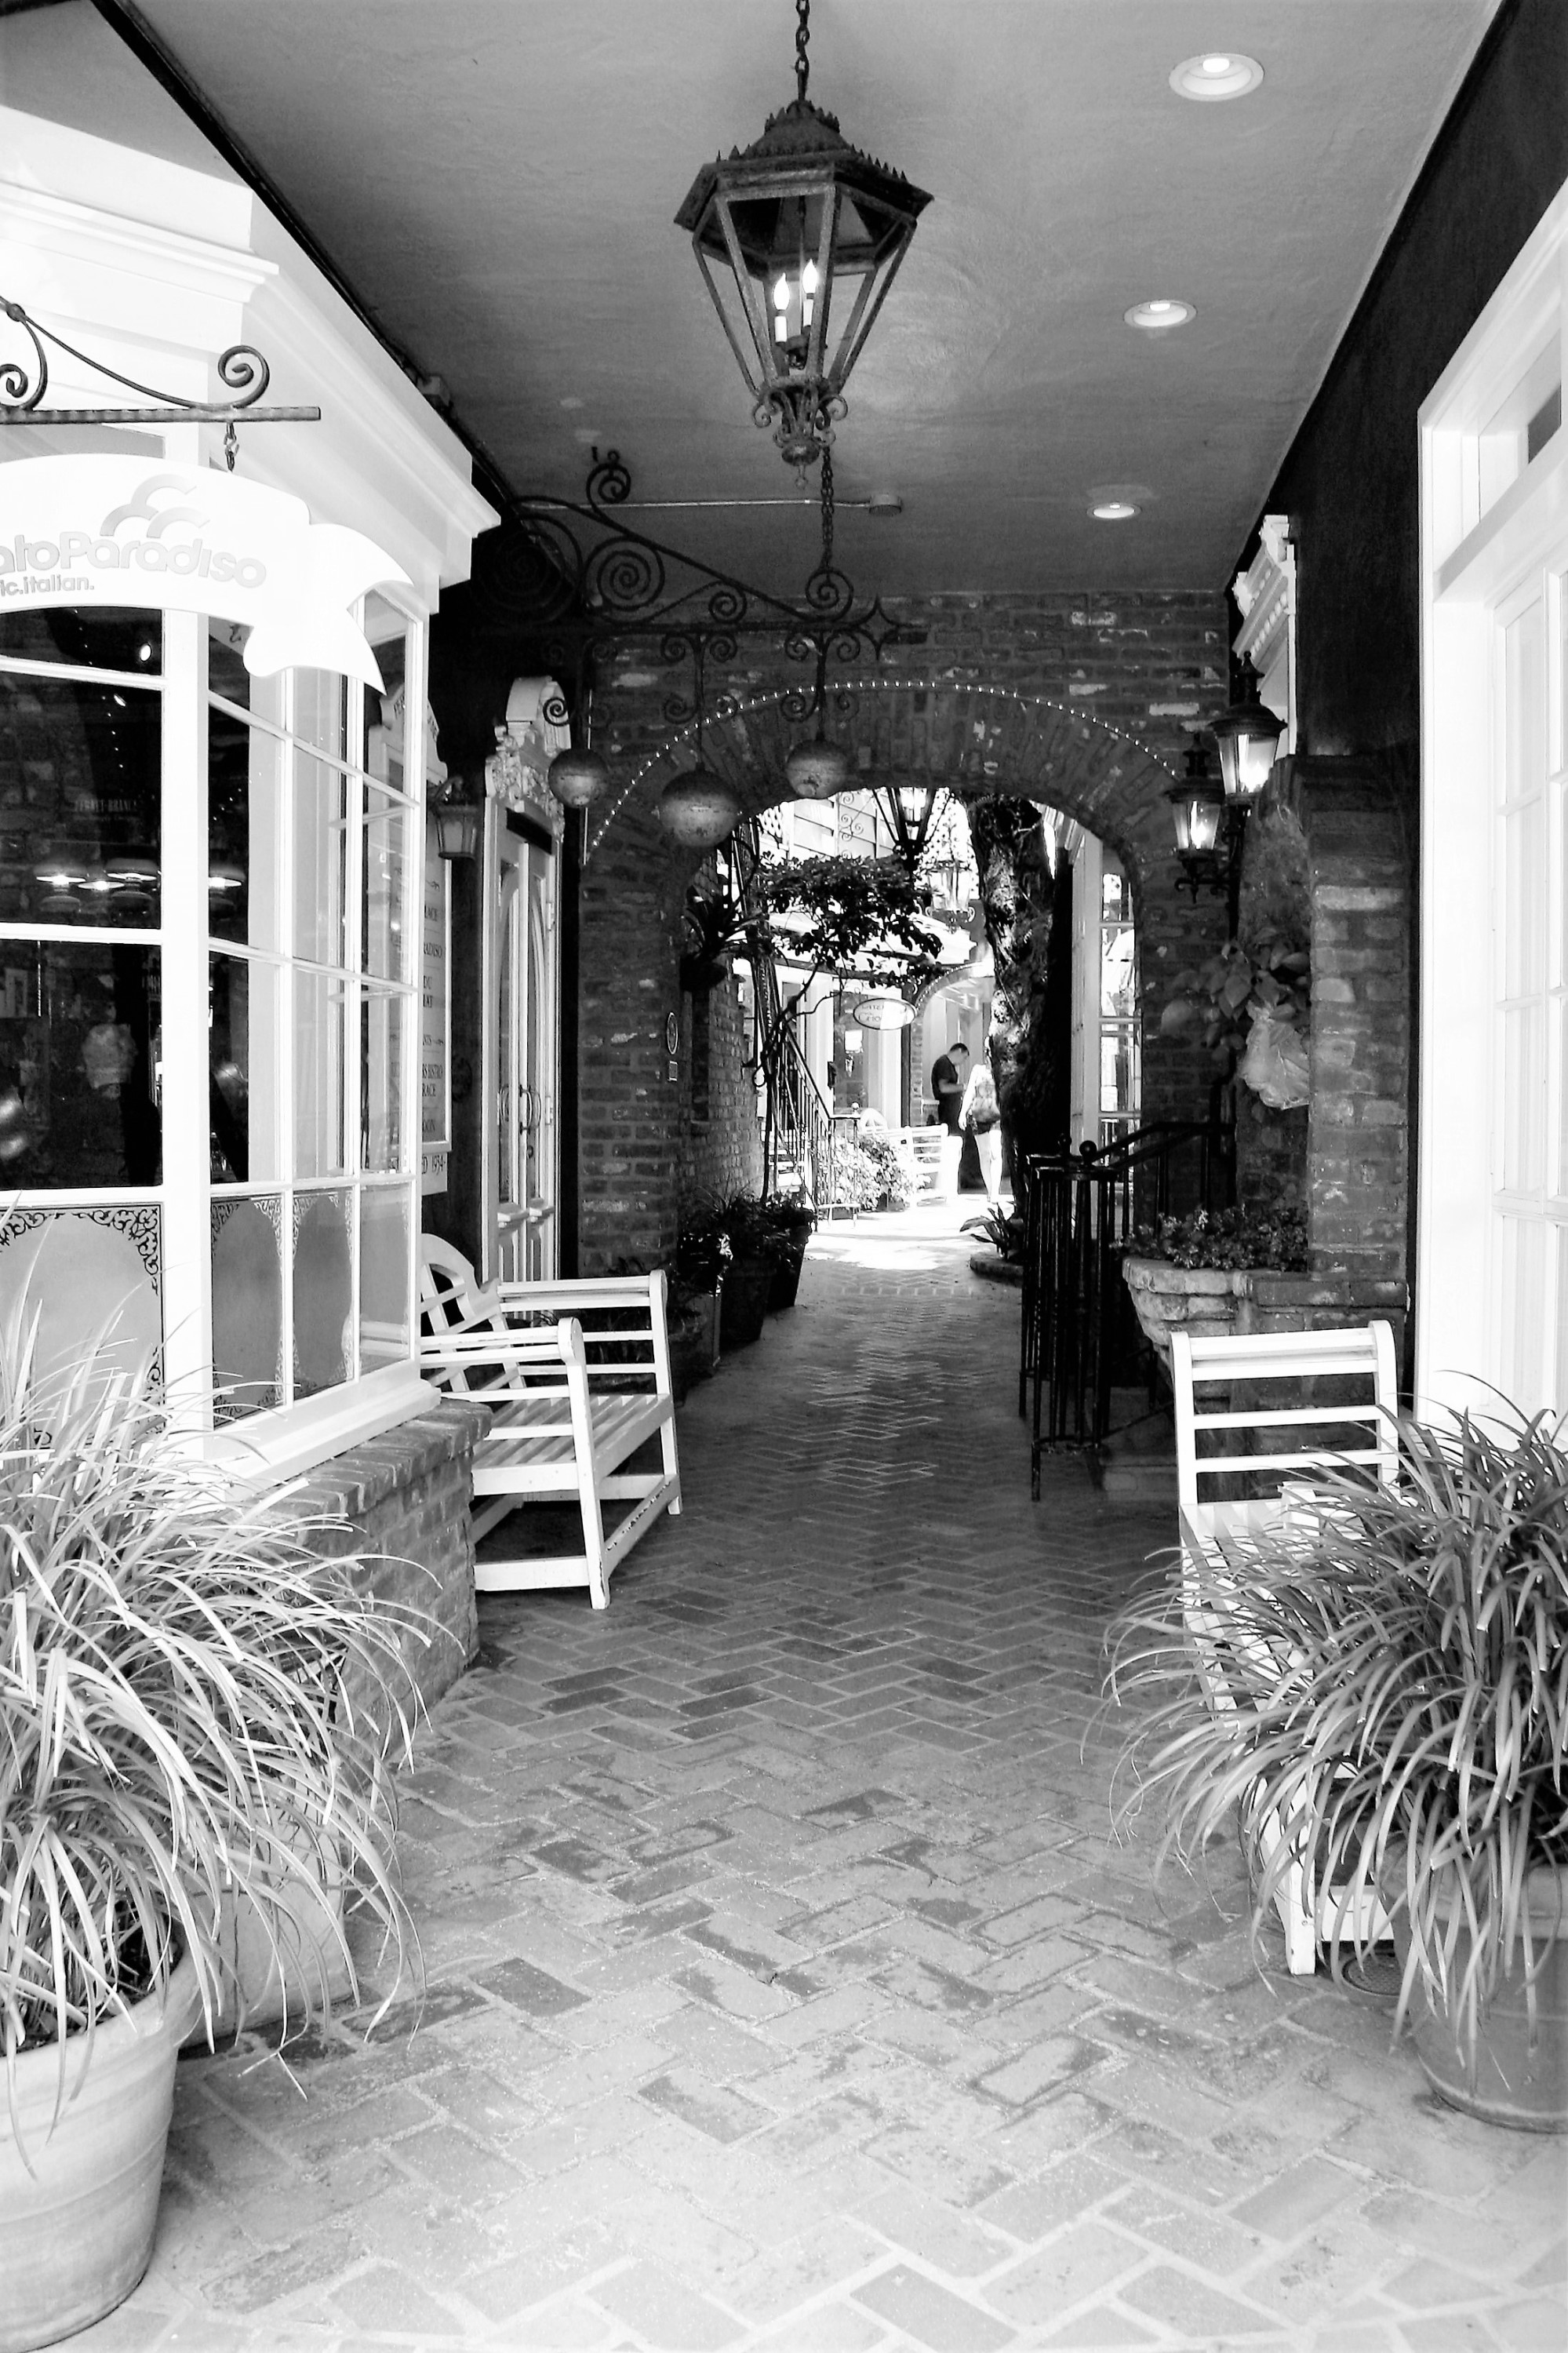 laguna beach shops, laguna beach, laguna beach alley